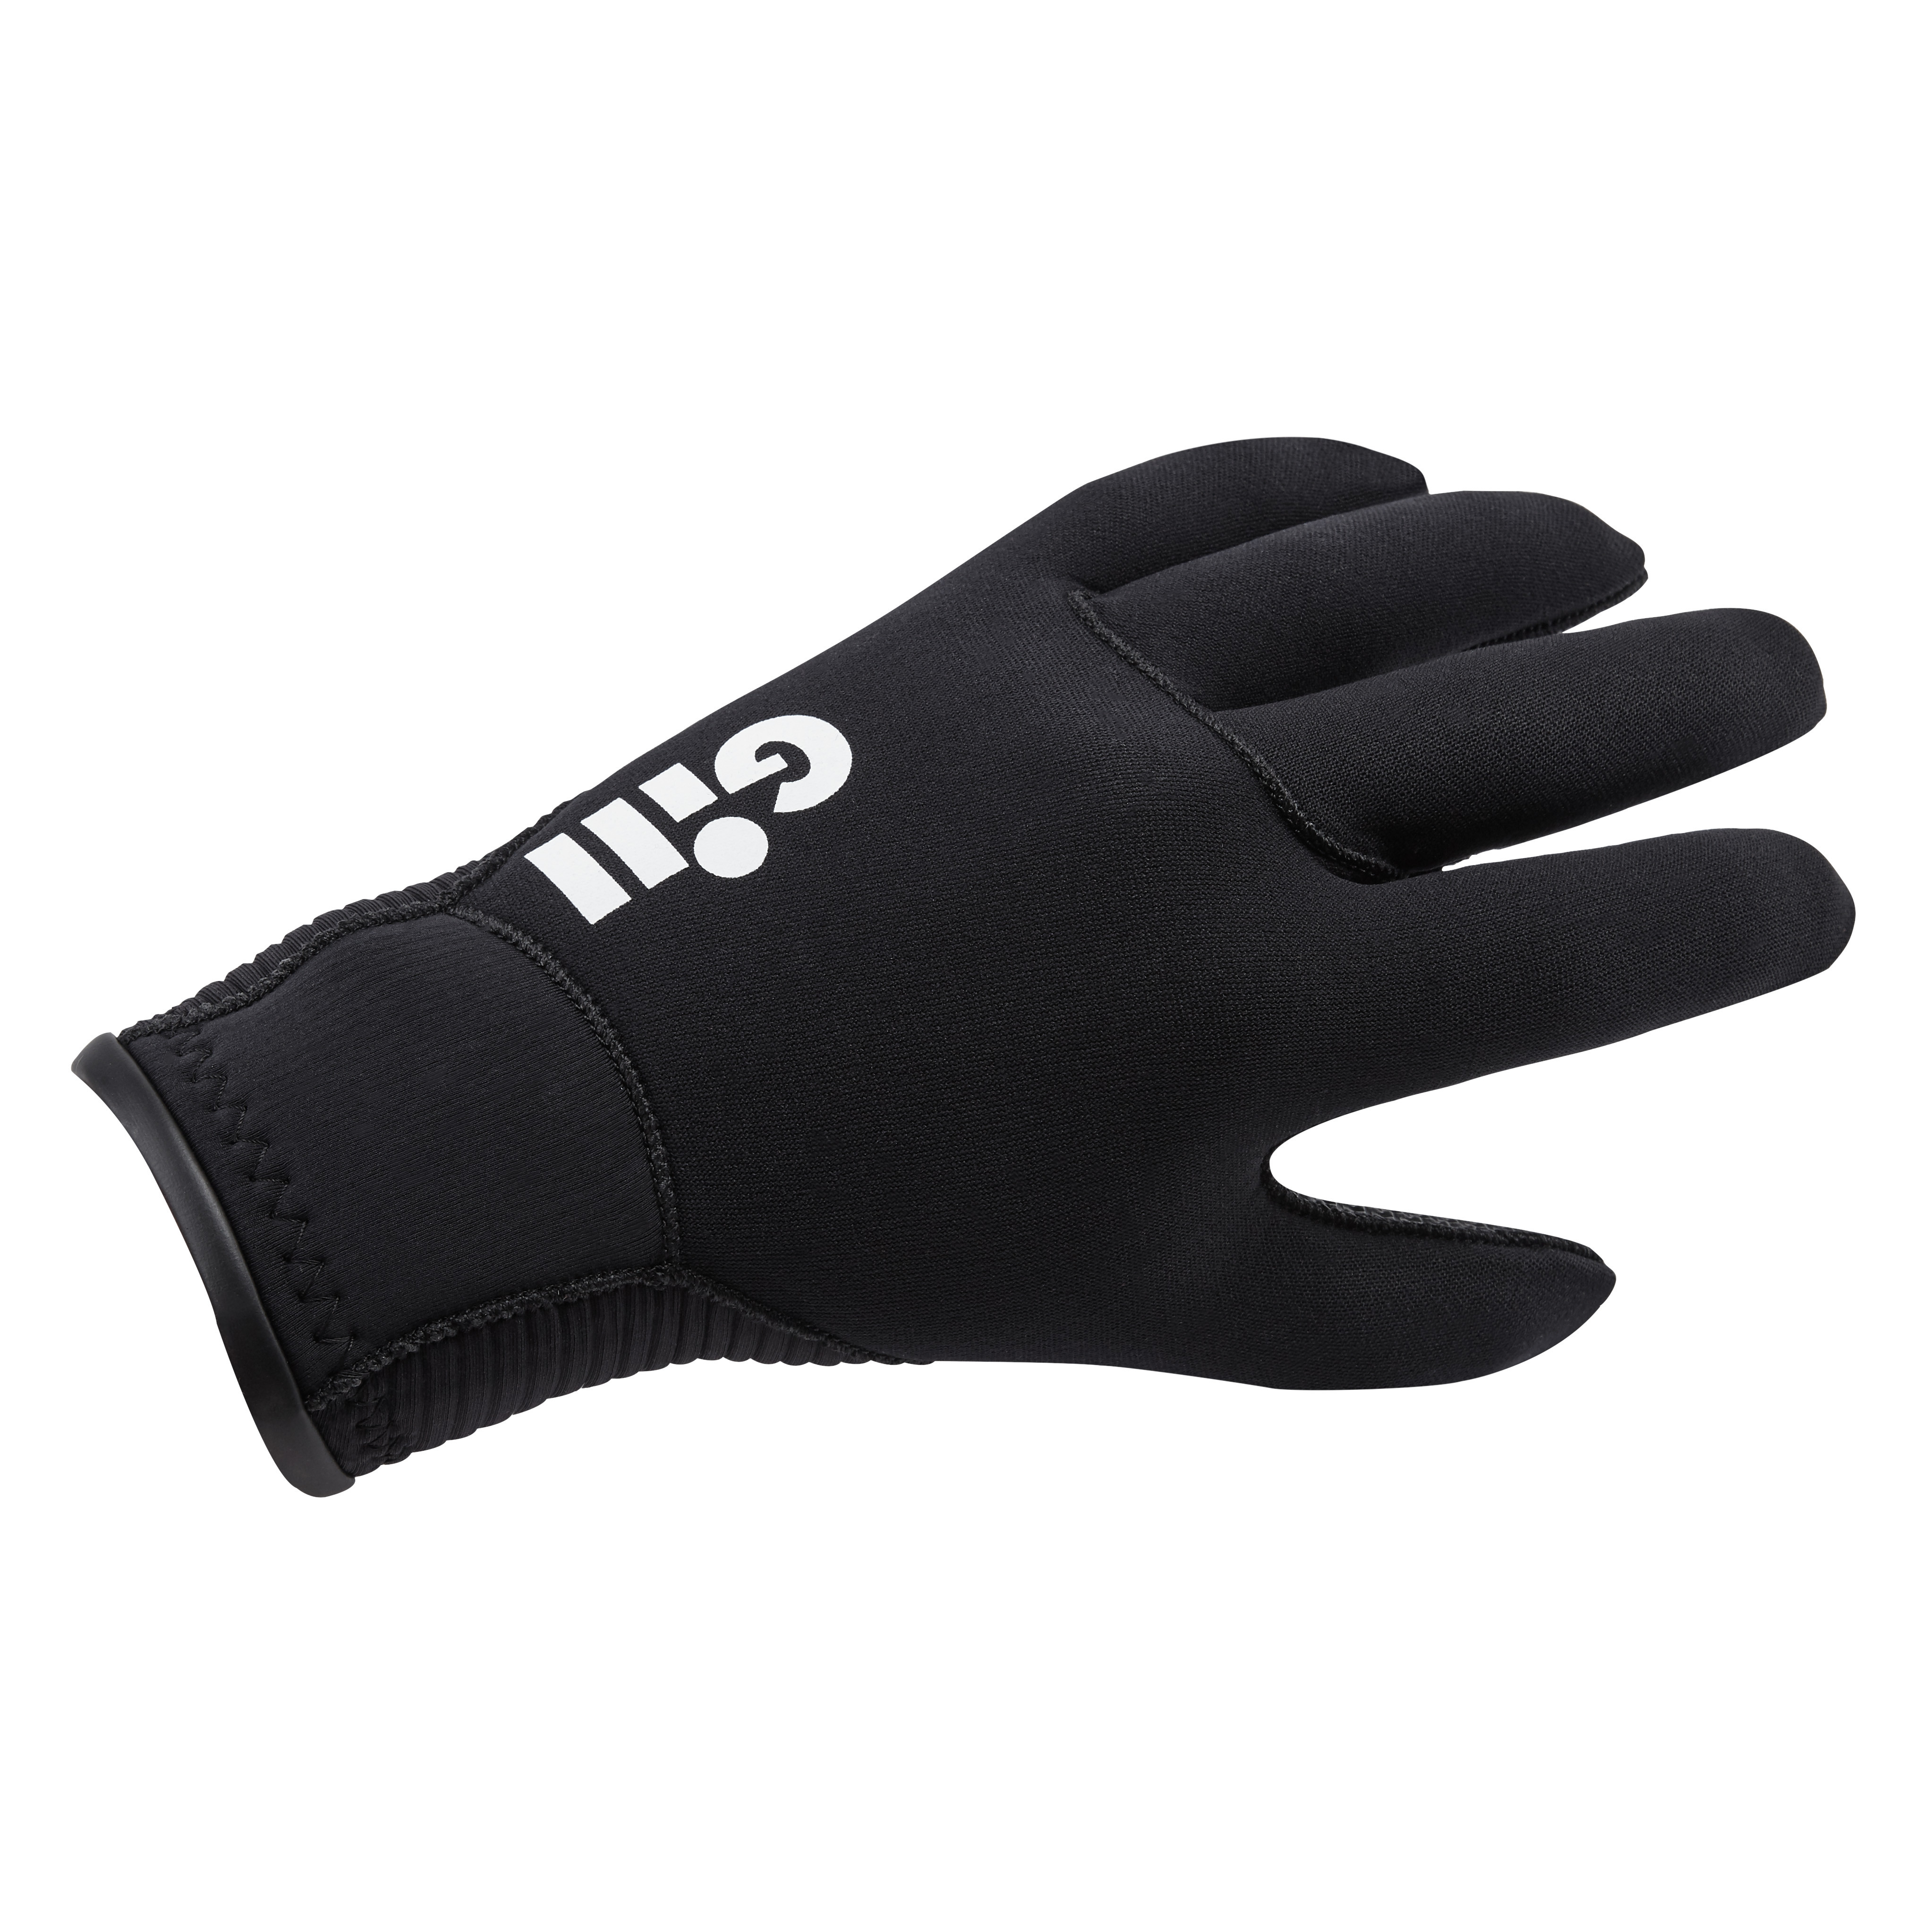 Junior Neoprene Winter Glove - 7672J-BLK01-1.jpg